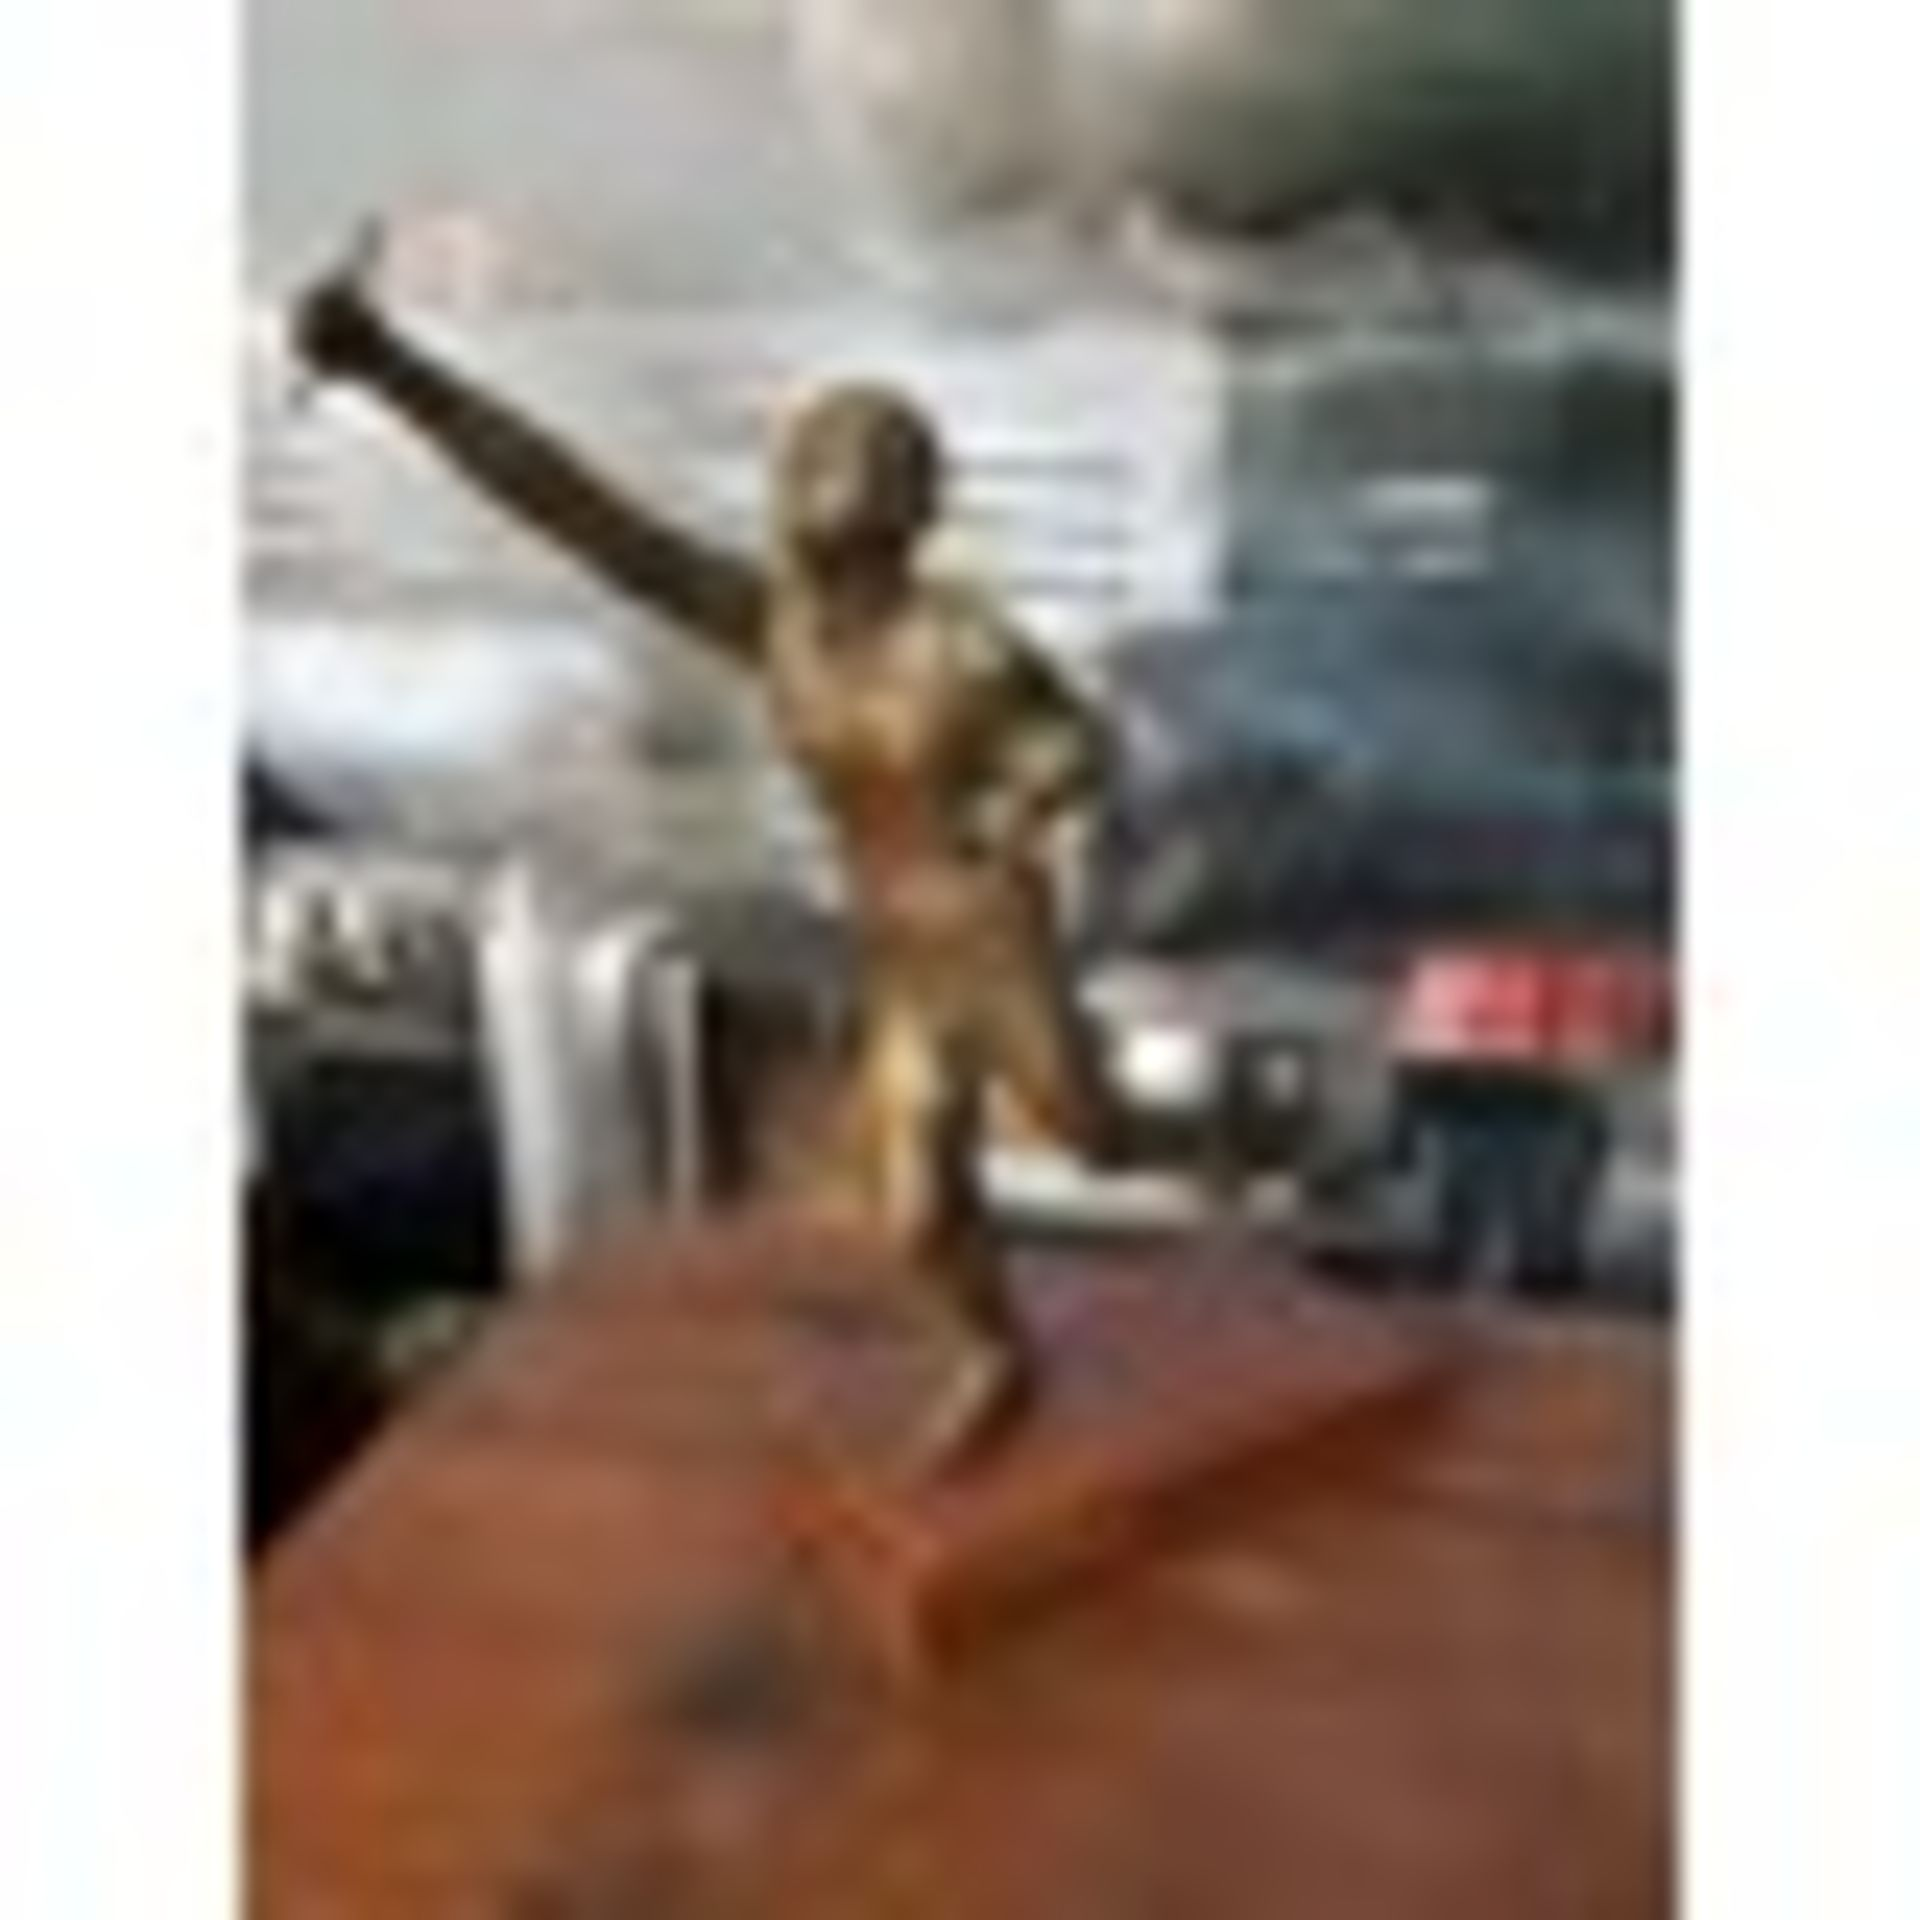 Lot 3 - Bronzed Resin Sport Man RS-08 Objets d'Art Decorative Accessories Carton 26 x 20 x 35cm MSRP £157